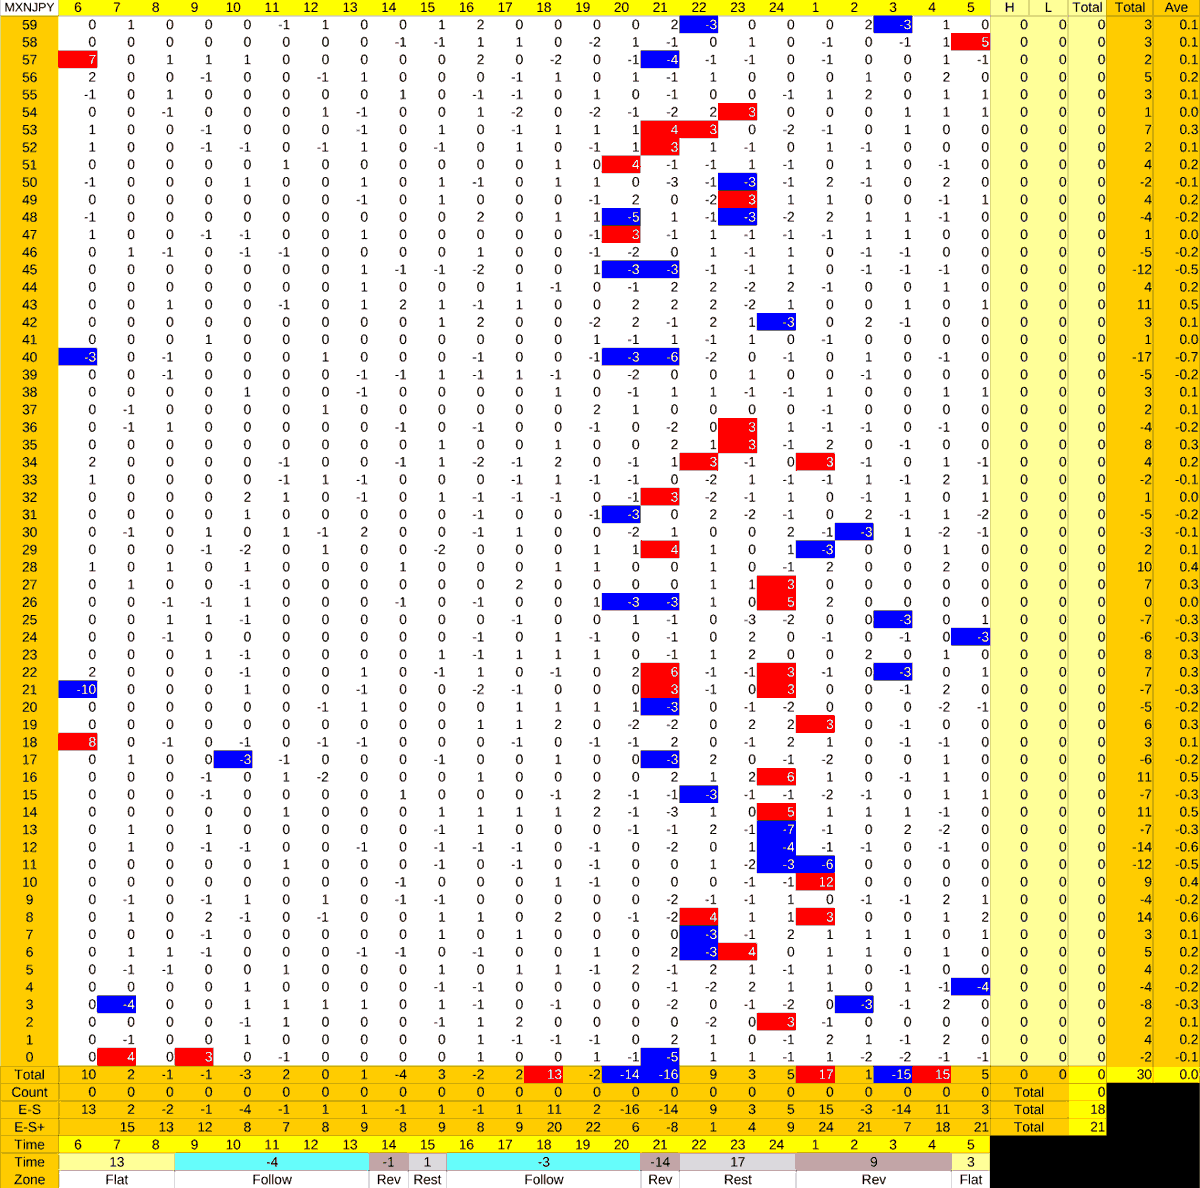 20210504_HS(3)MXNJPY